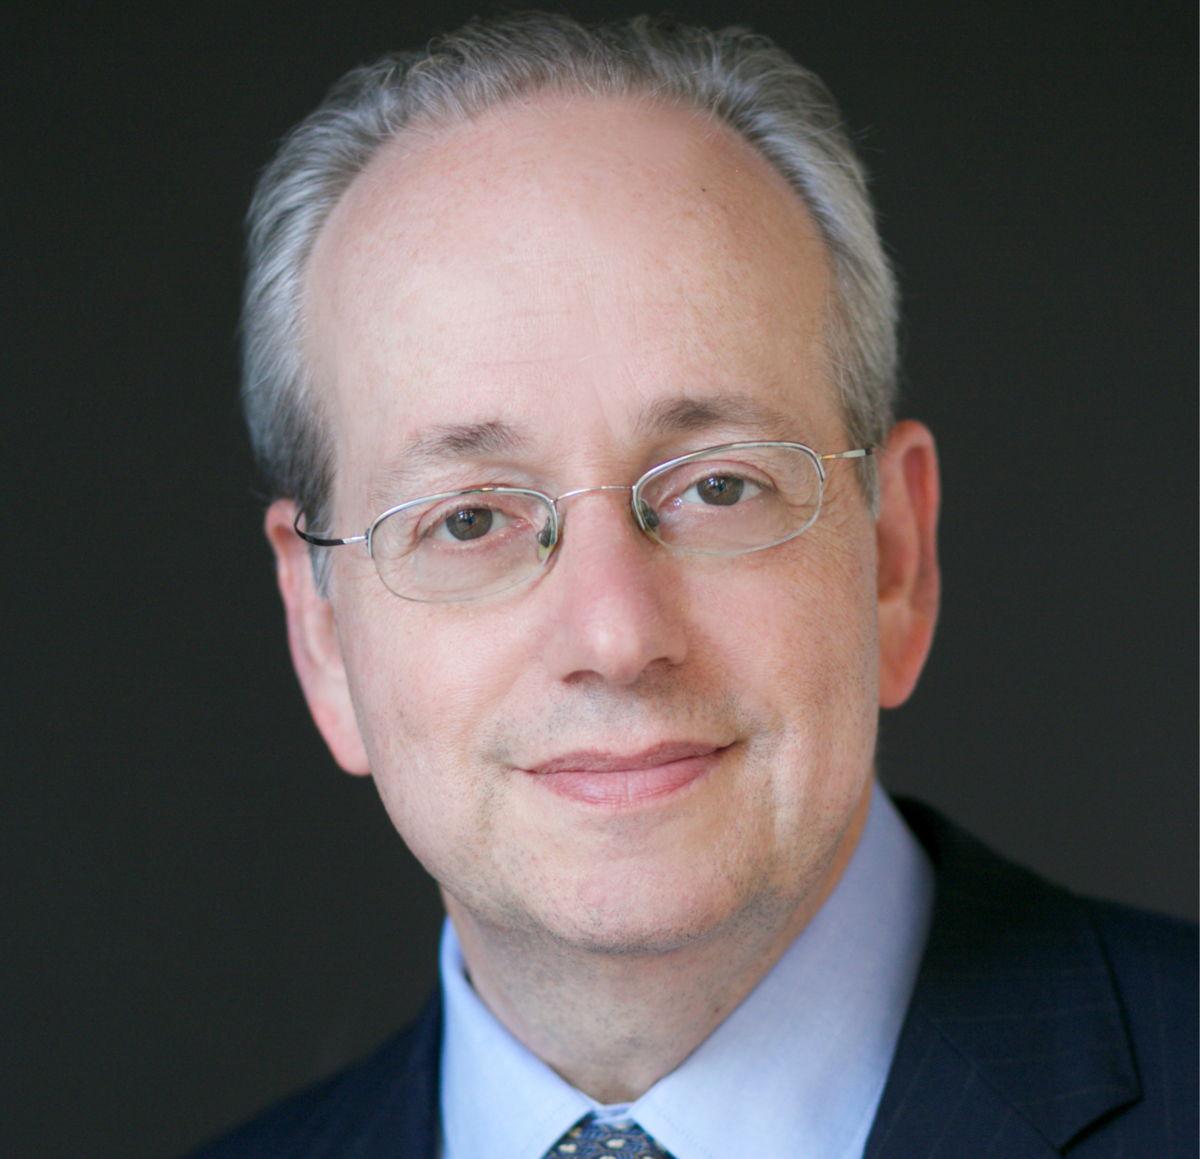 Gordon Crovitz, co-founder of NewsGuard